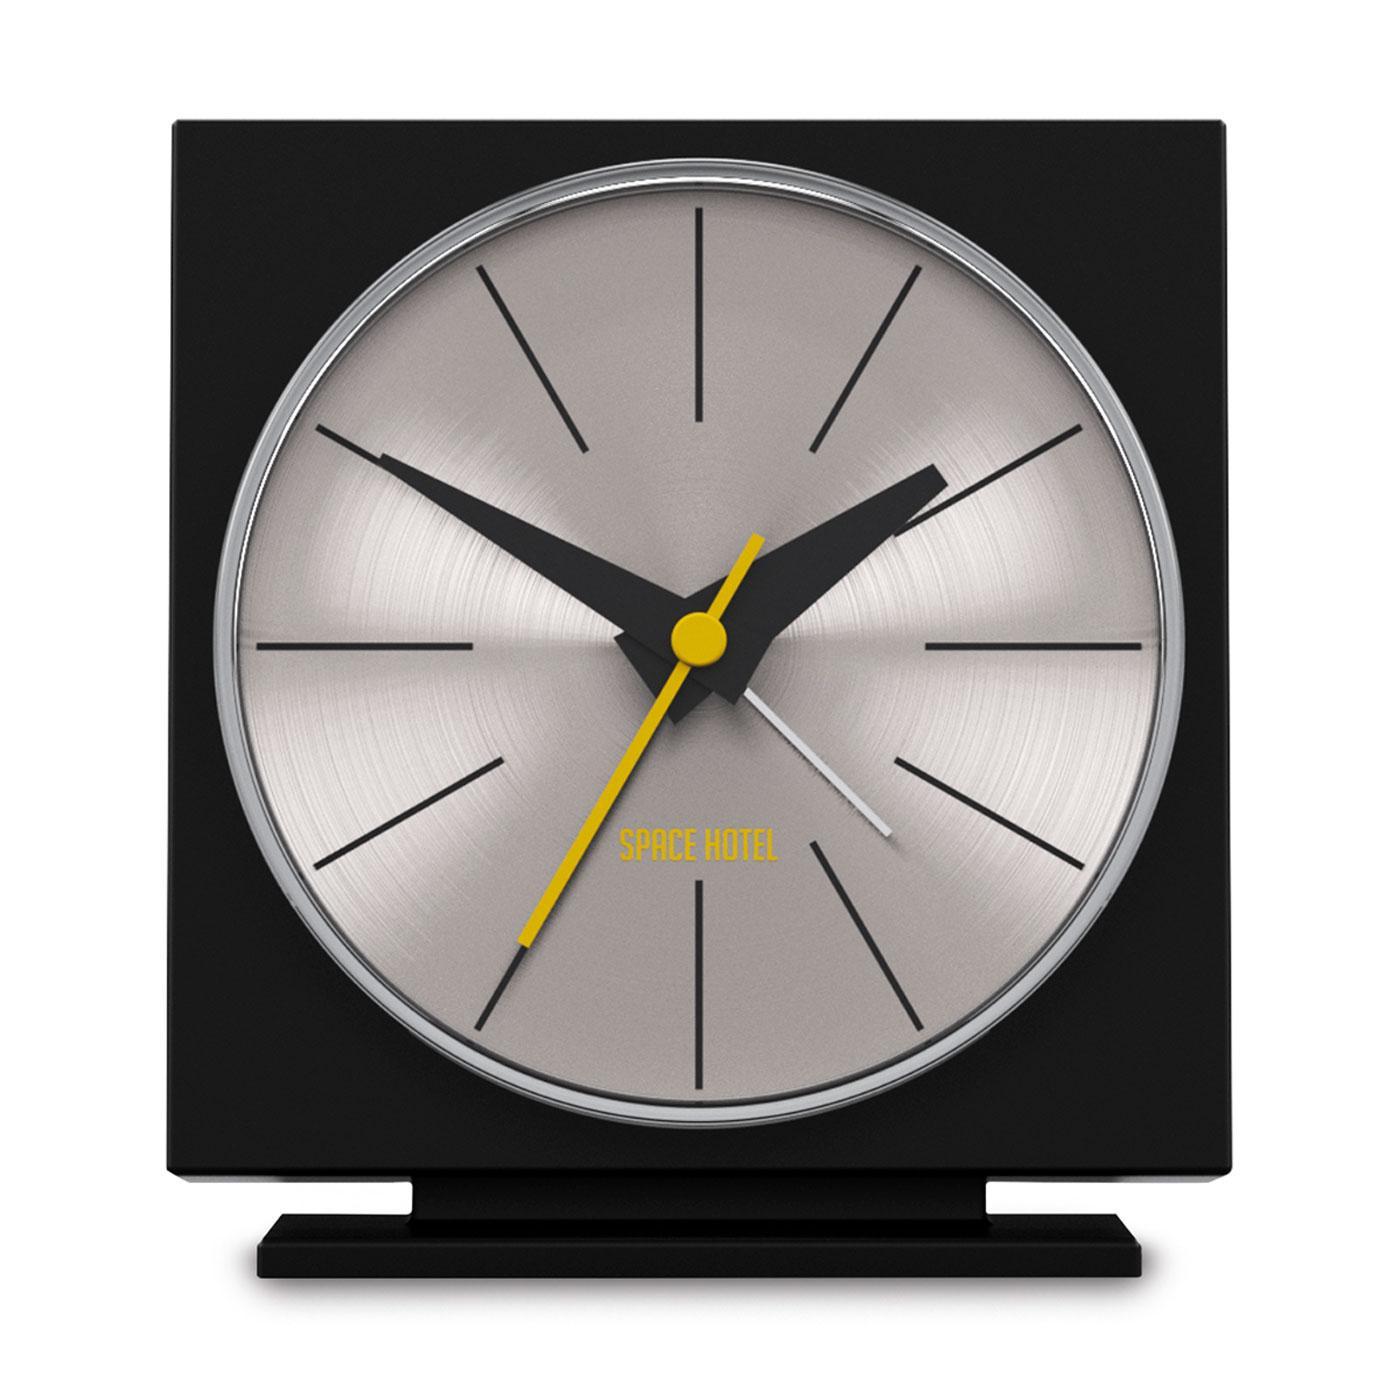 Bobby Dazzler NEWGATE CLOCKS Space Hotel Clock